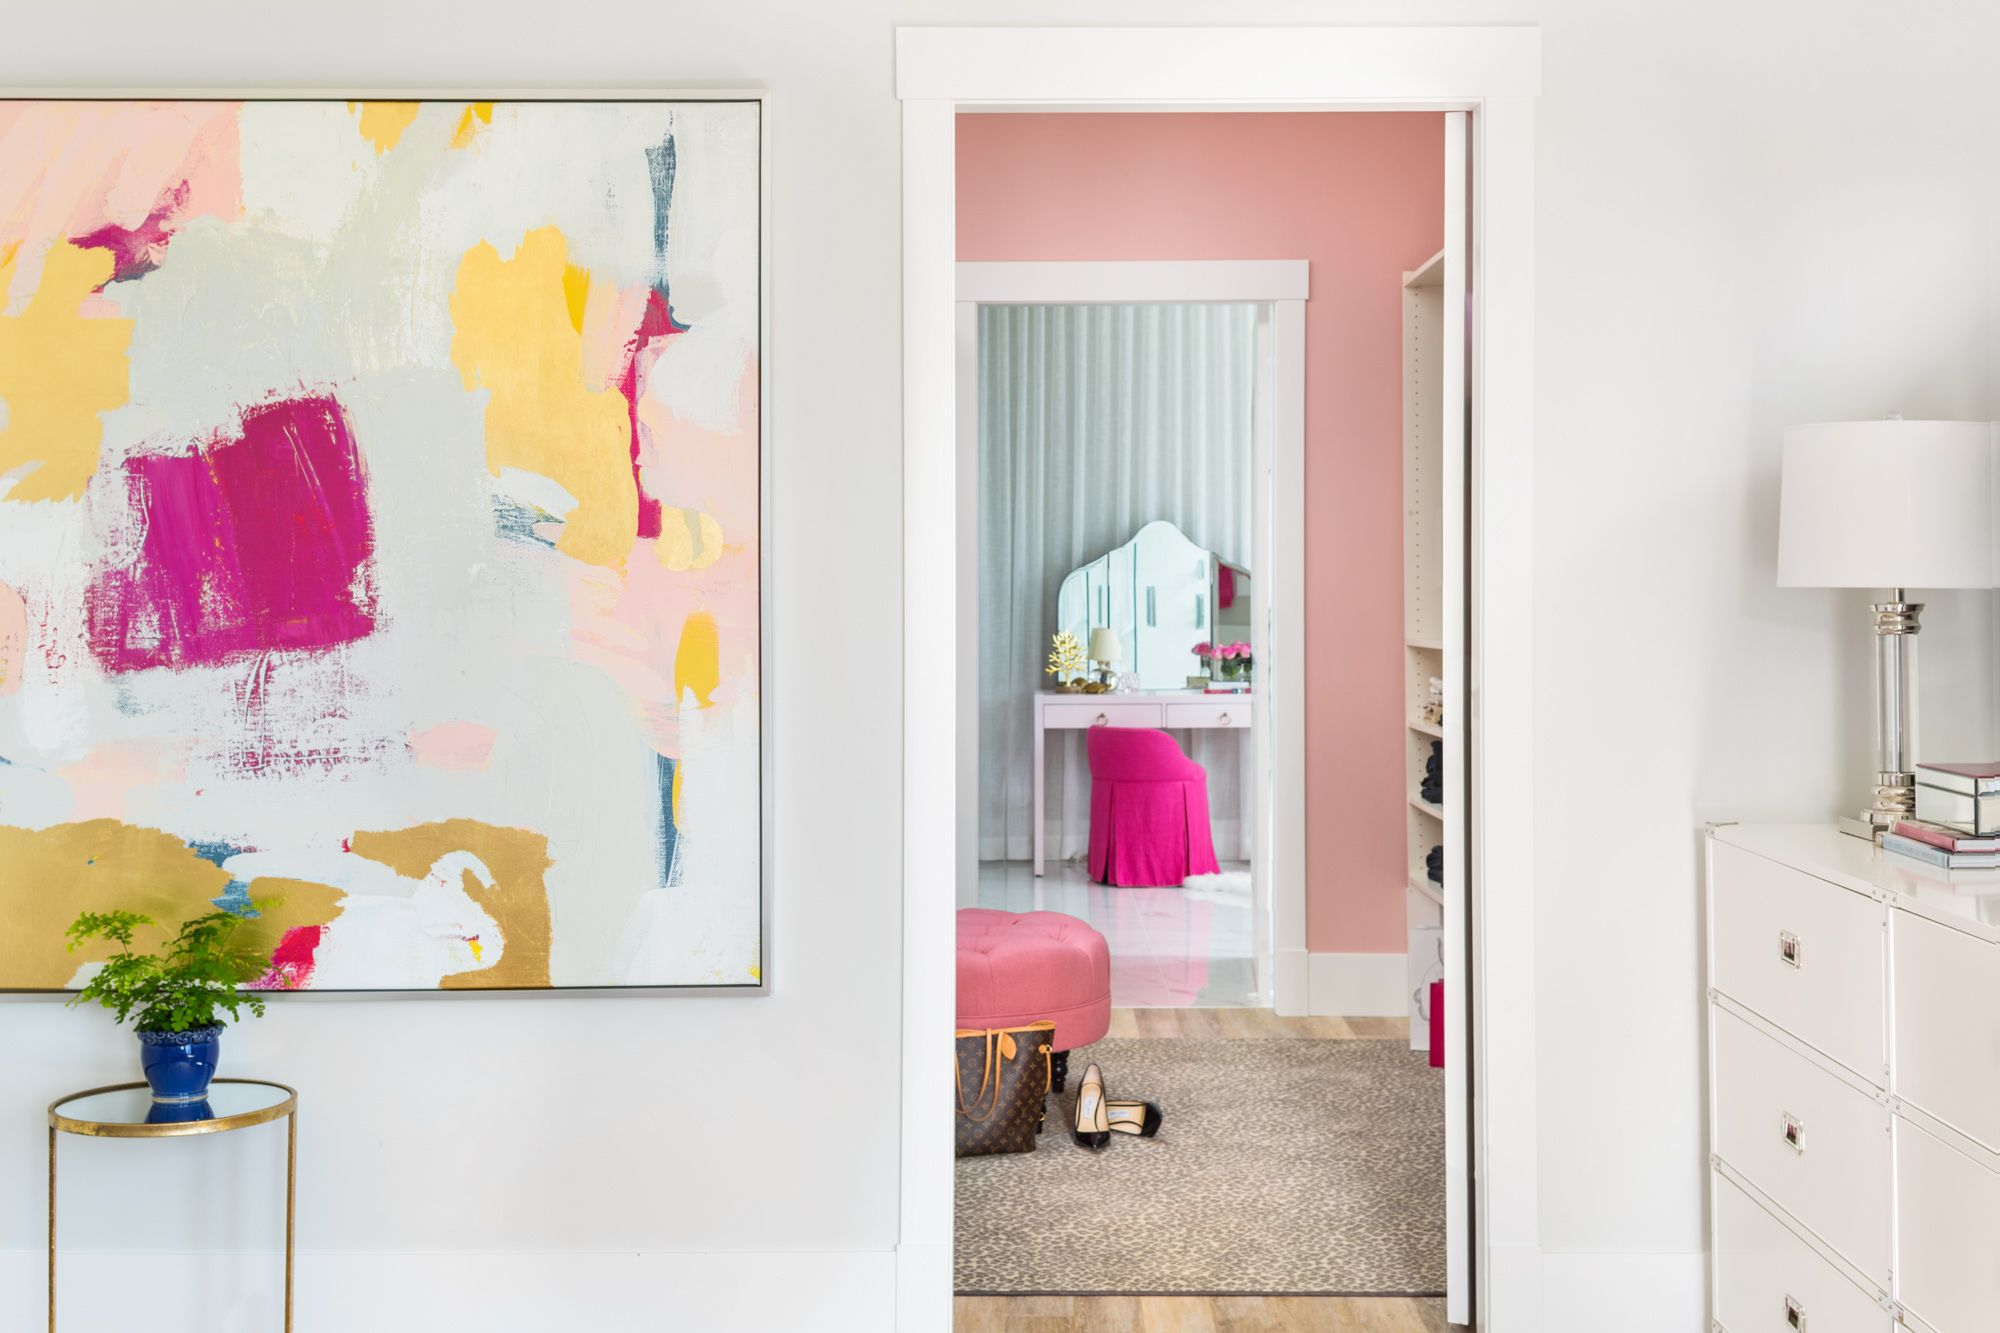 Master bedroom ensuite  Pink and Navy Master Bedroom  Ensuite Before u After  bathrooms